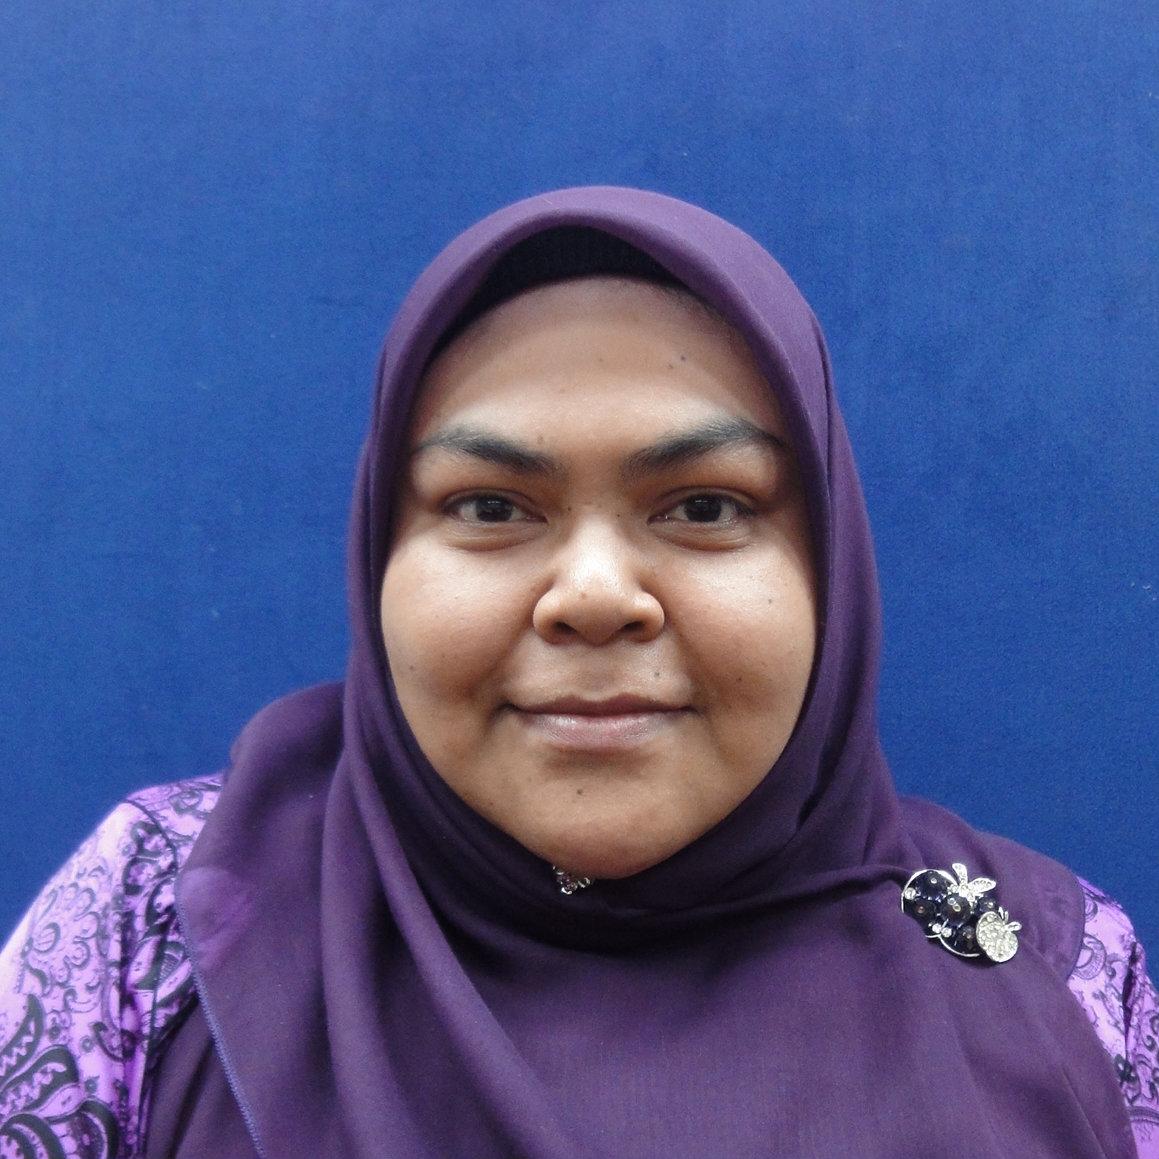 Pn. Sarasyima Binti Md Salleh